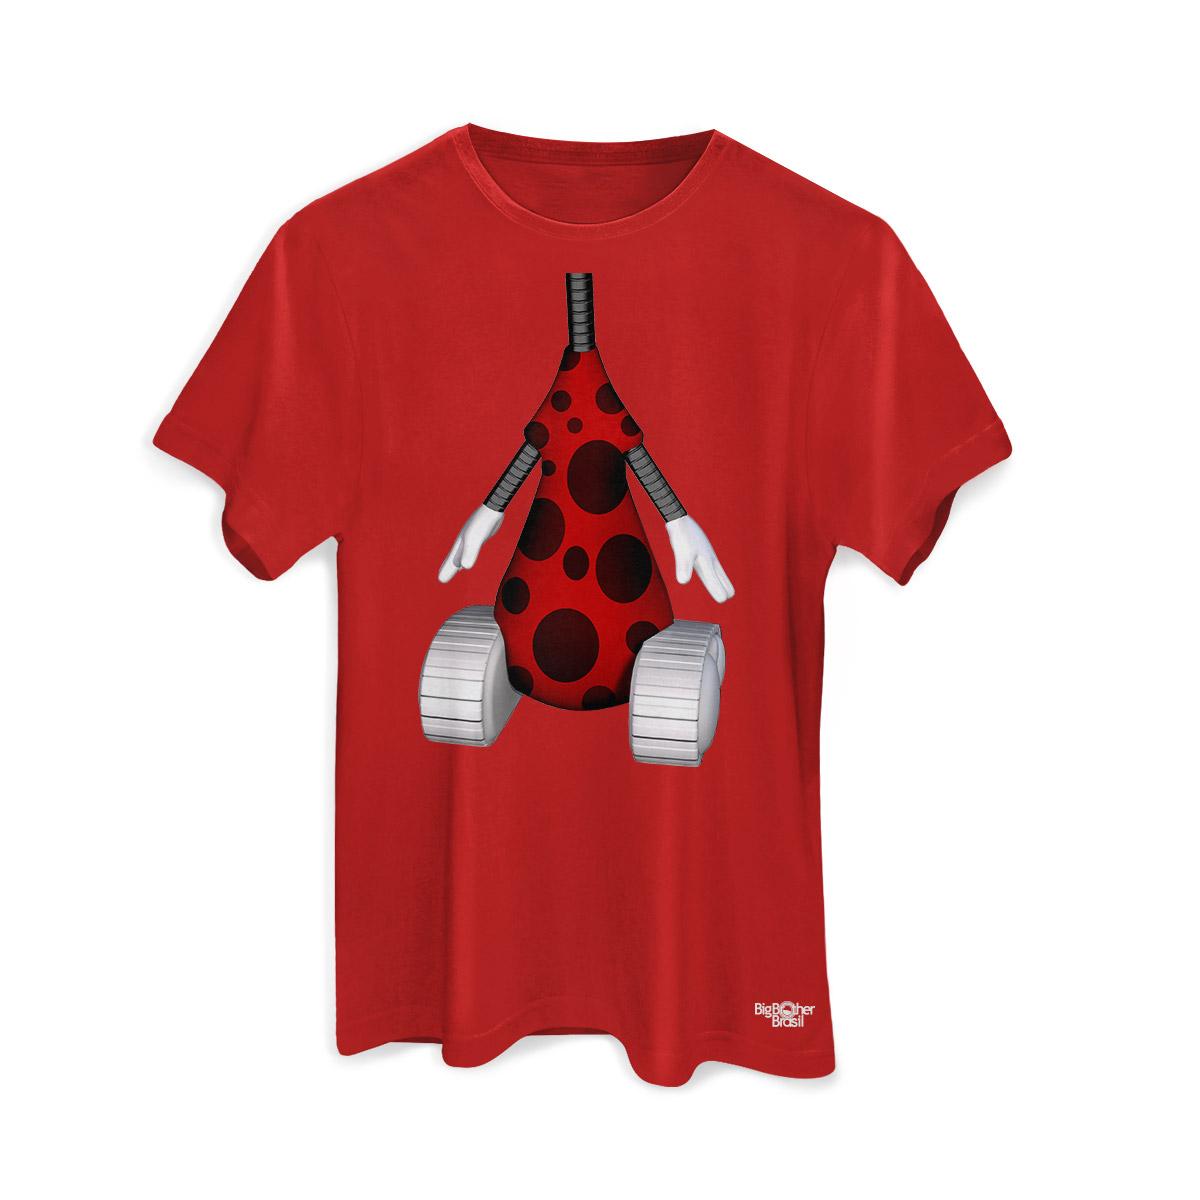 Camiseta Masculina Big Brother Brasil 15 RoBBB Joaninha